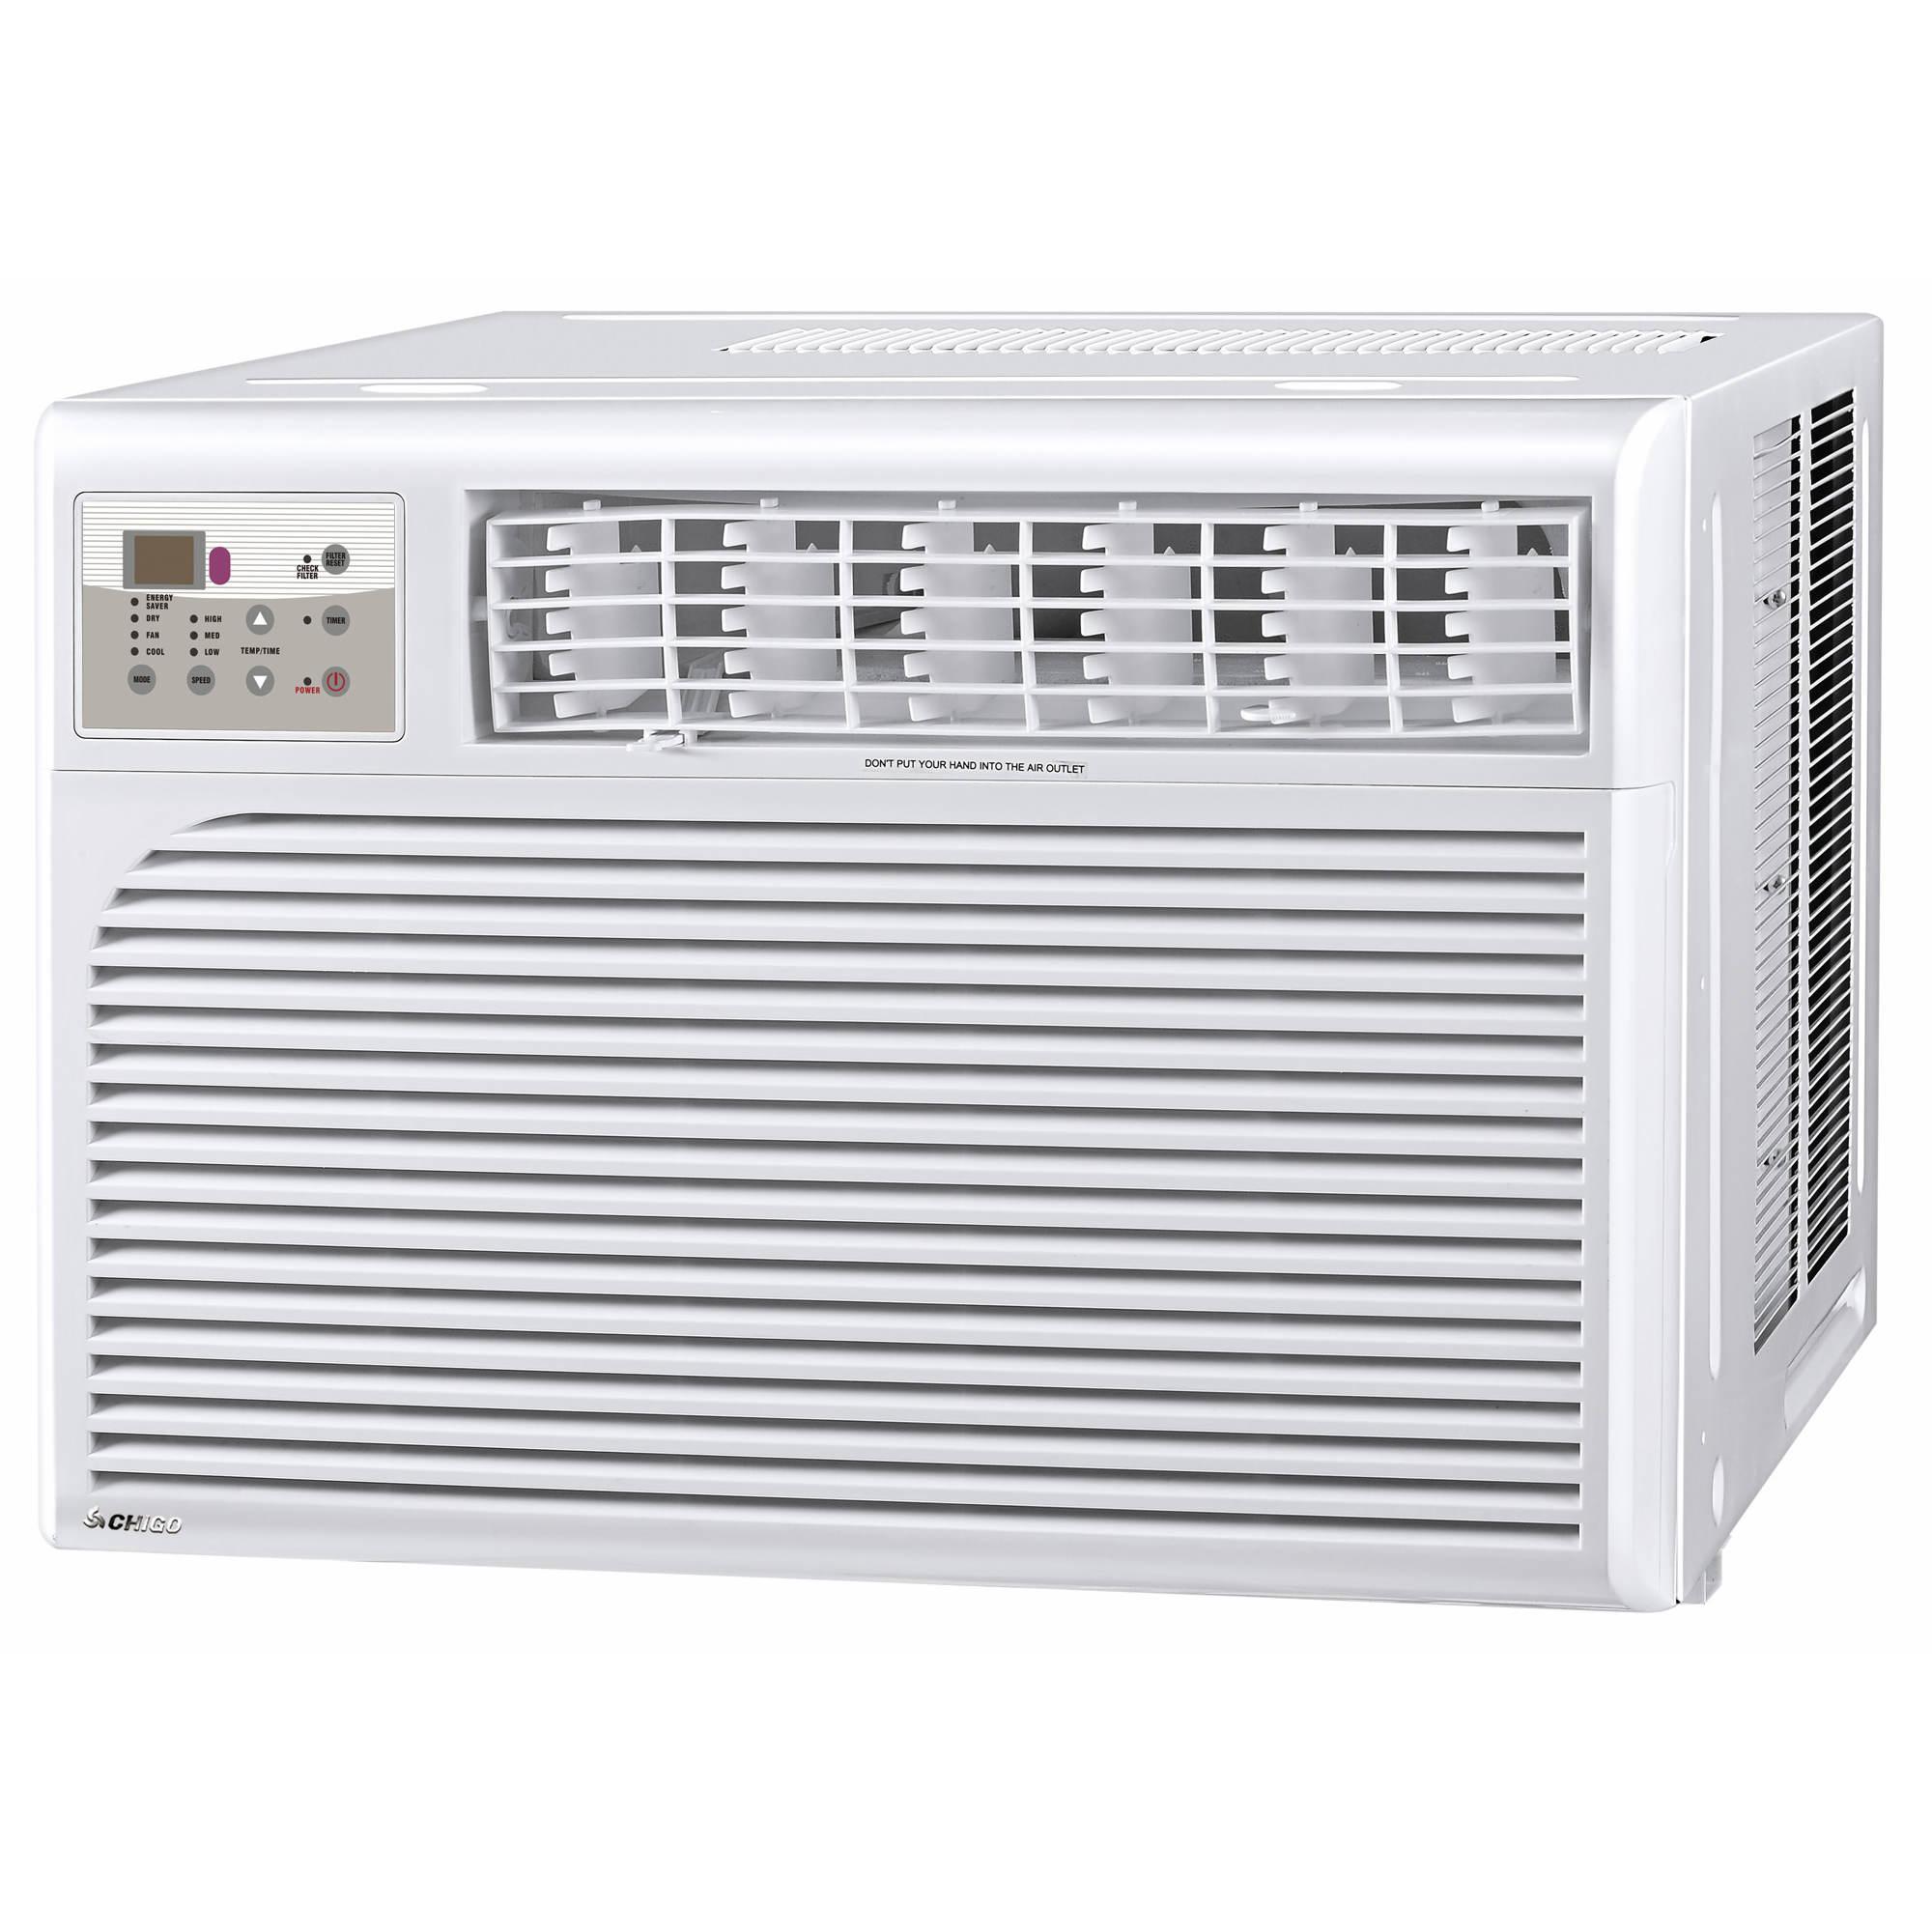 Lifezone 12 000 btu window air conditioner with remote for 12k btu window air conditioner